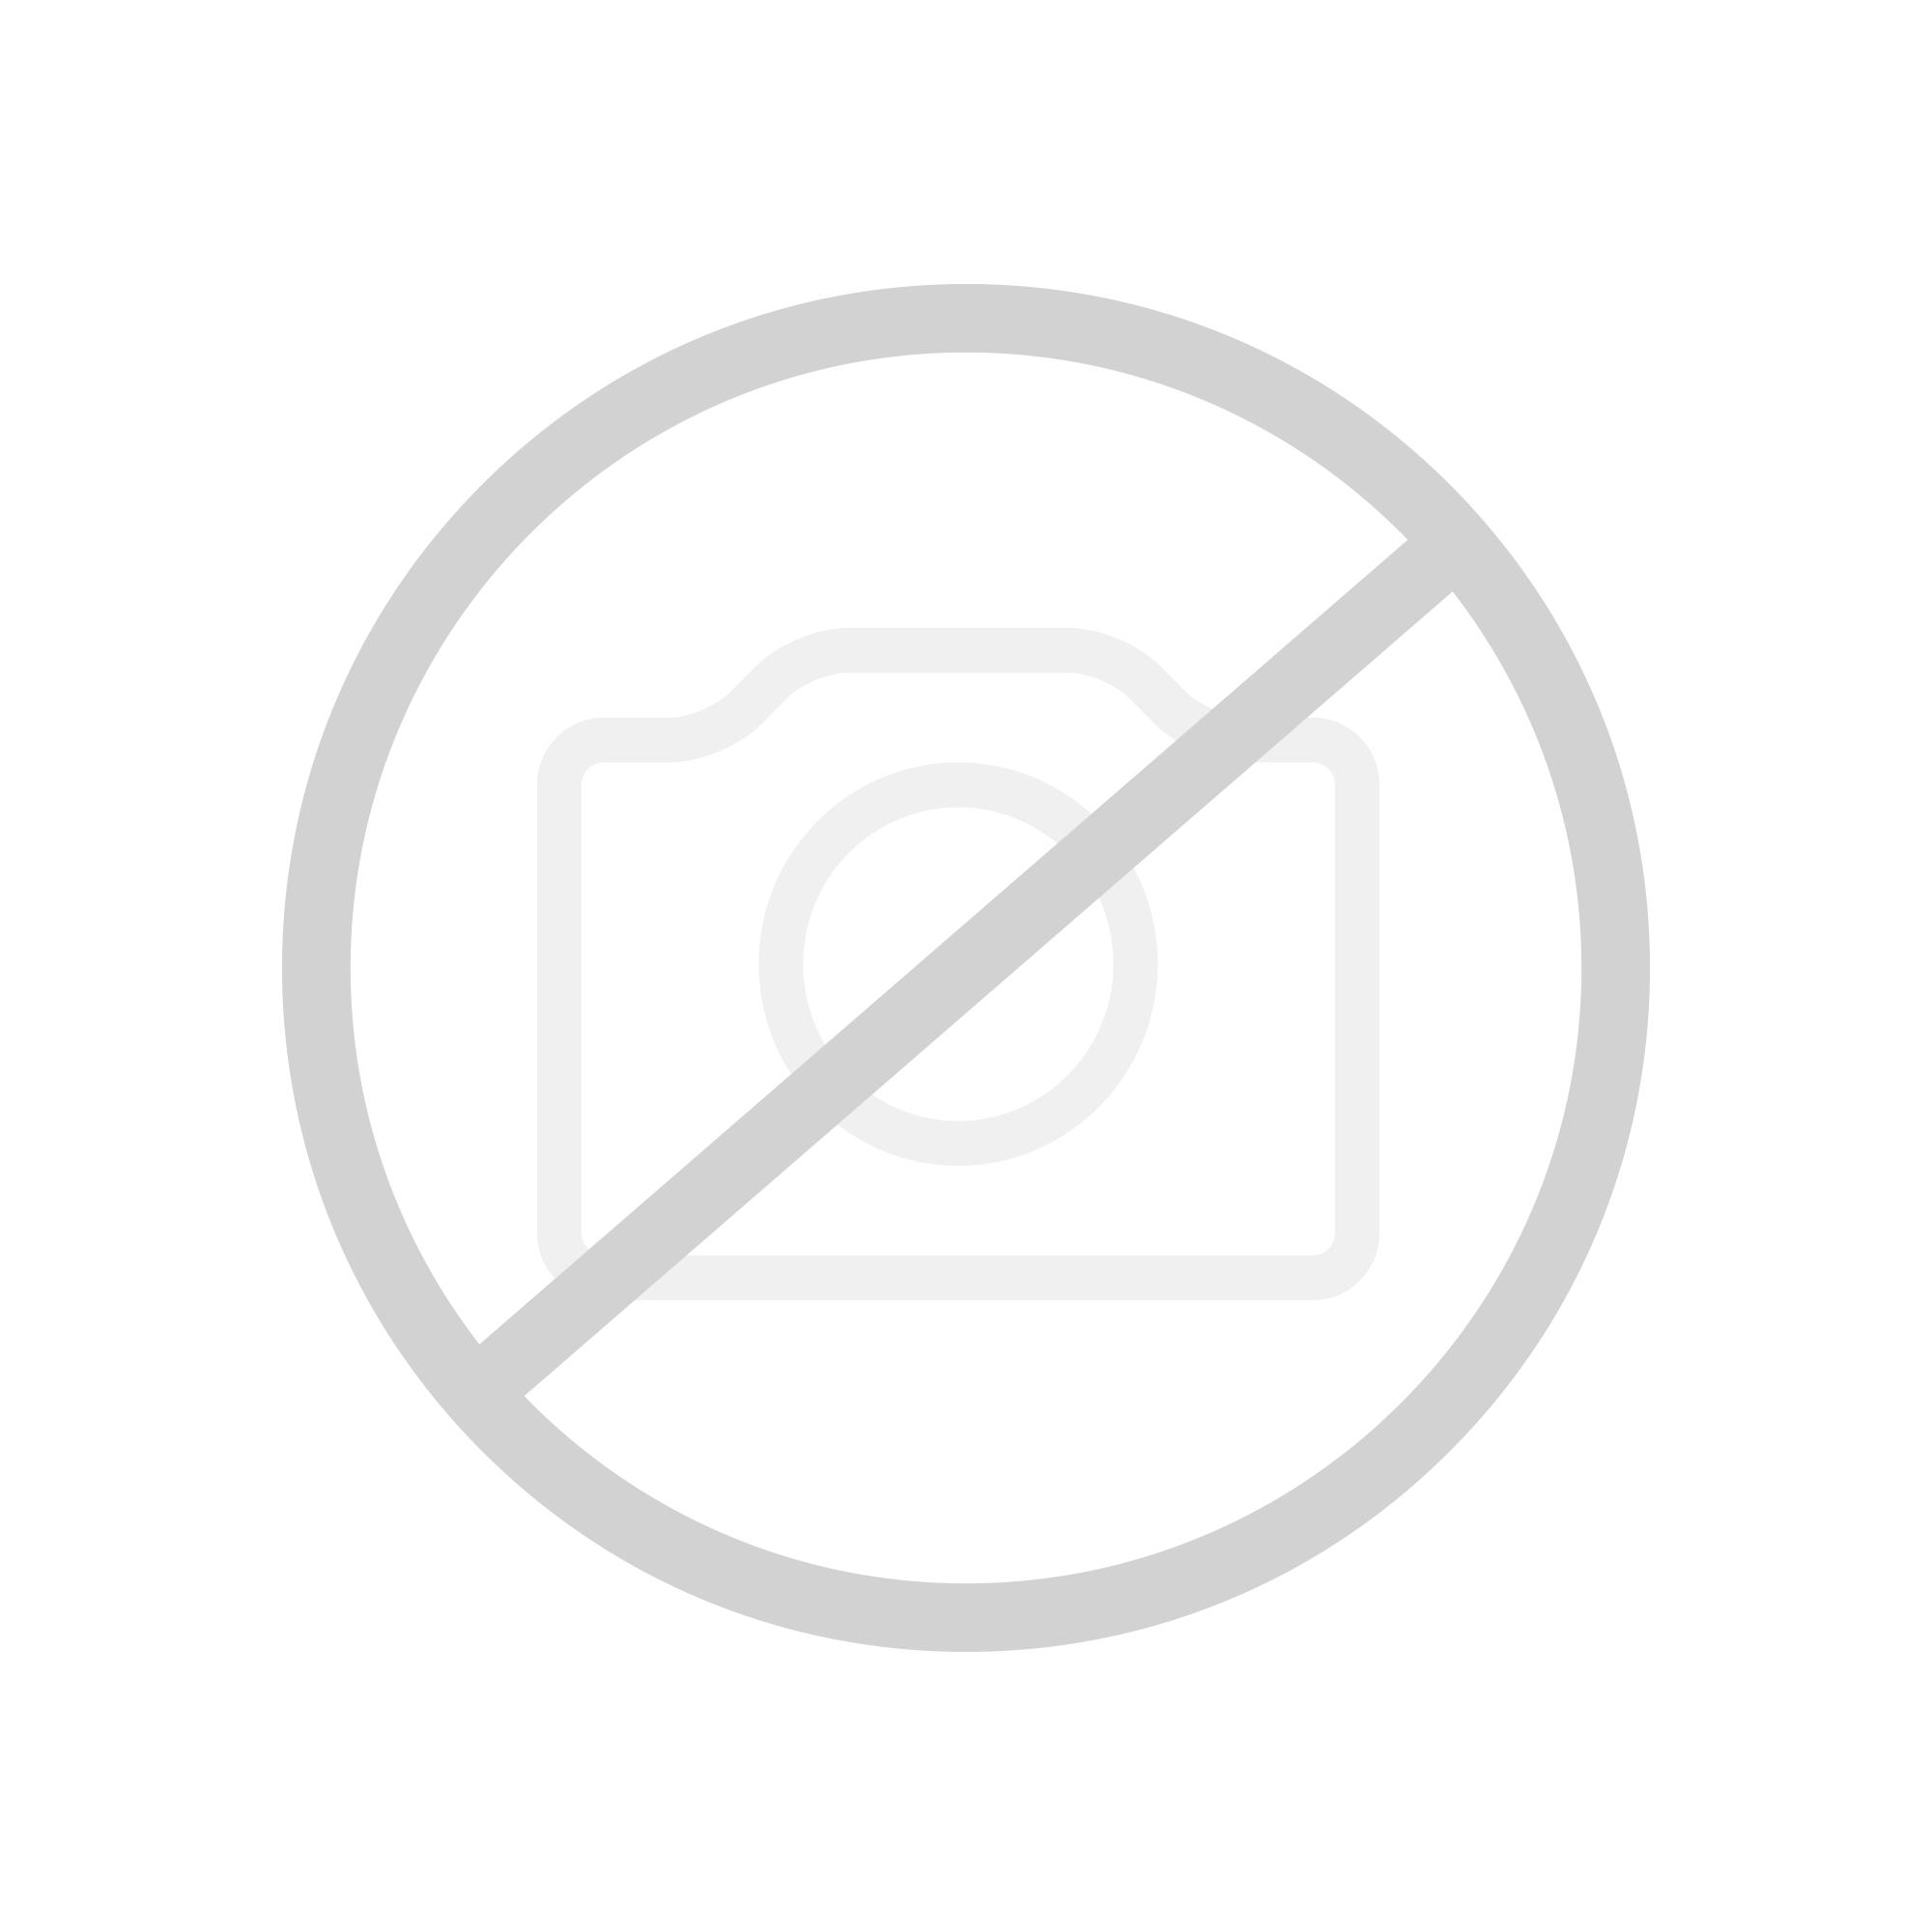 Keuco Royal Reflex Waschtischunterschrank mit 1 Auszug Front Glas trüffel / Korpus trüffel seidenmatt